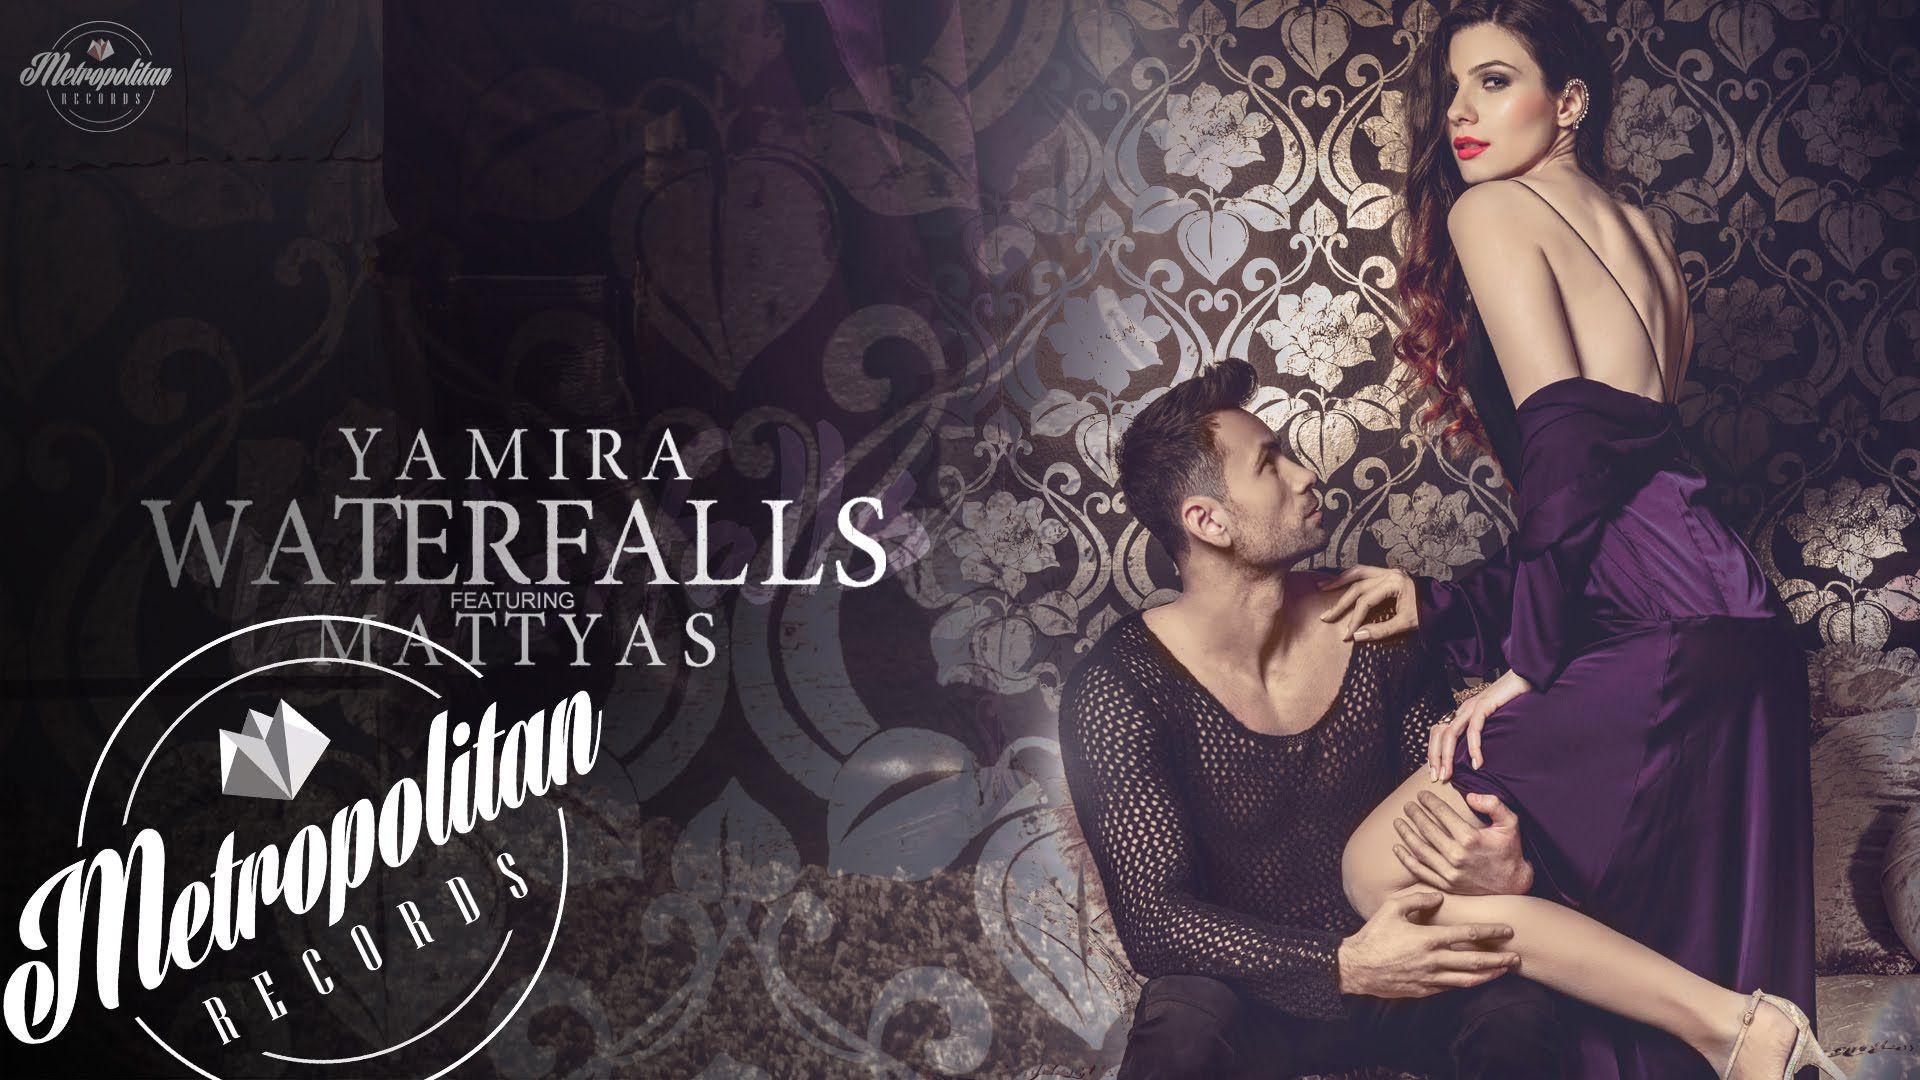 Yamira feat  Mattyas - Waterfalls (by Deepside Deejays